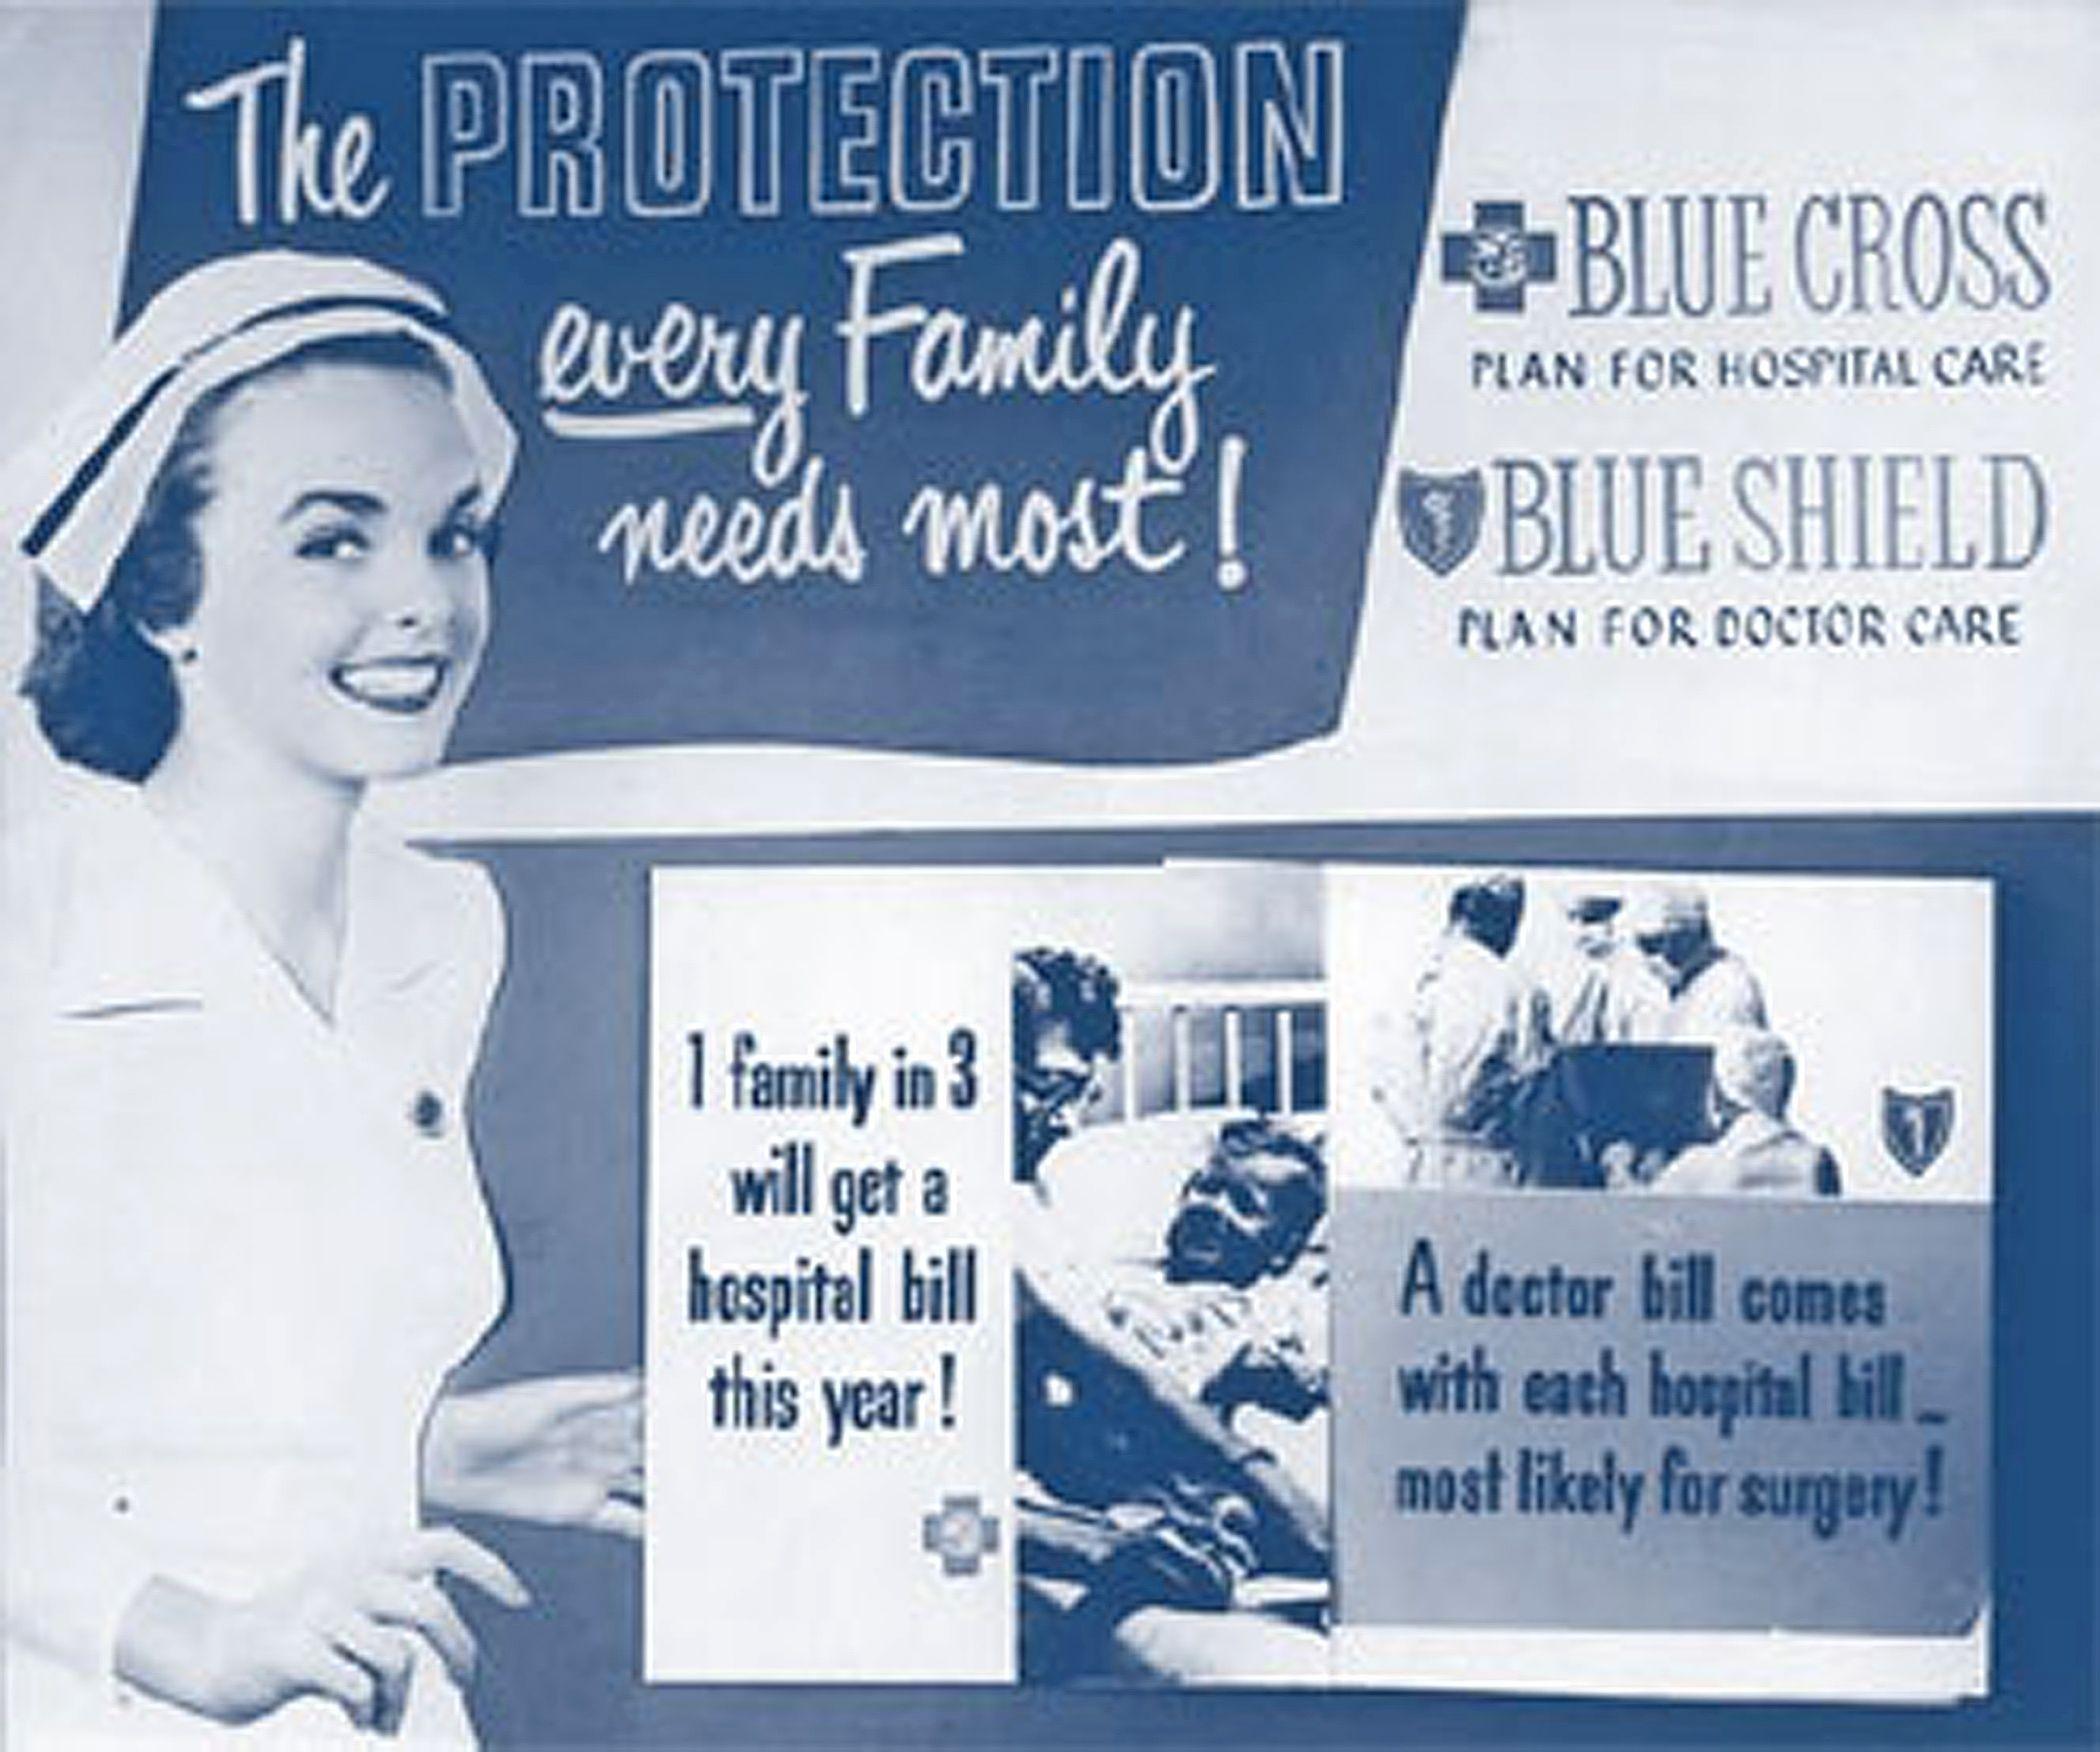 1940s blue cross blue shield advertisement doctor care